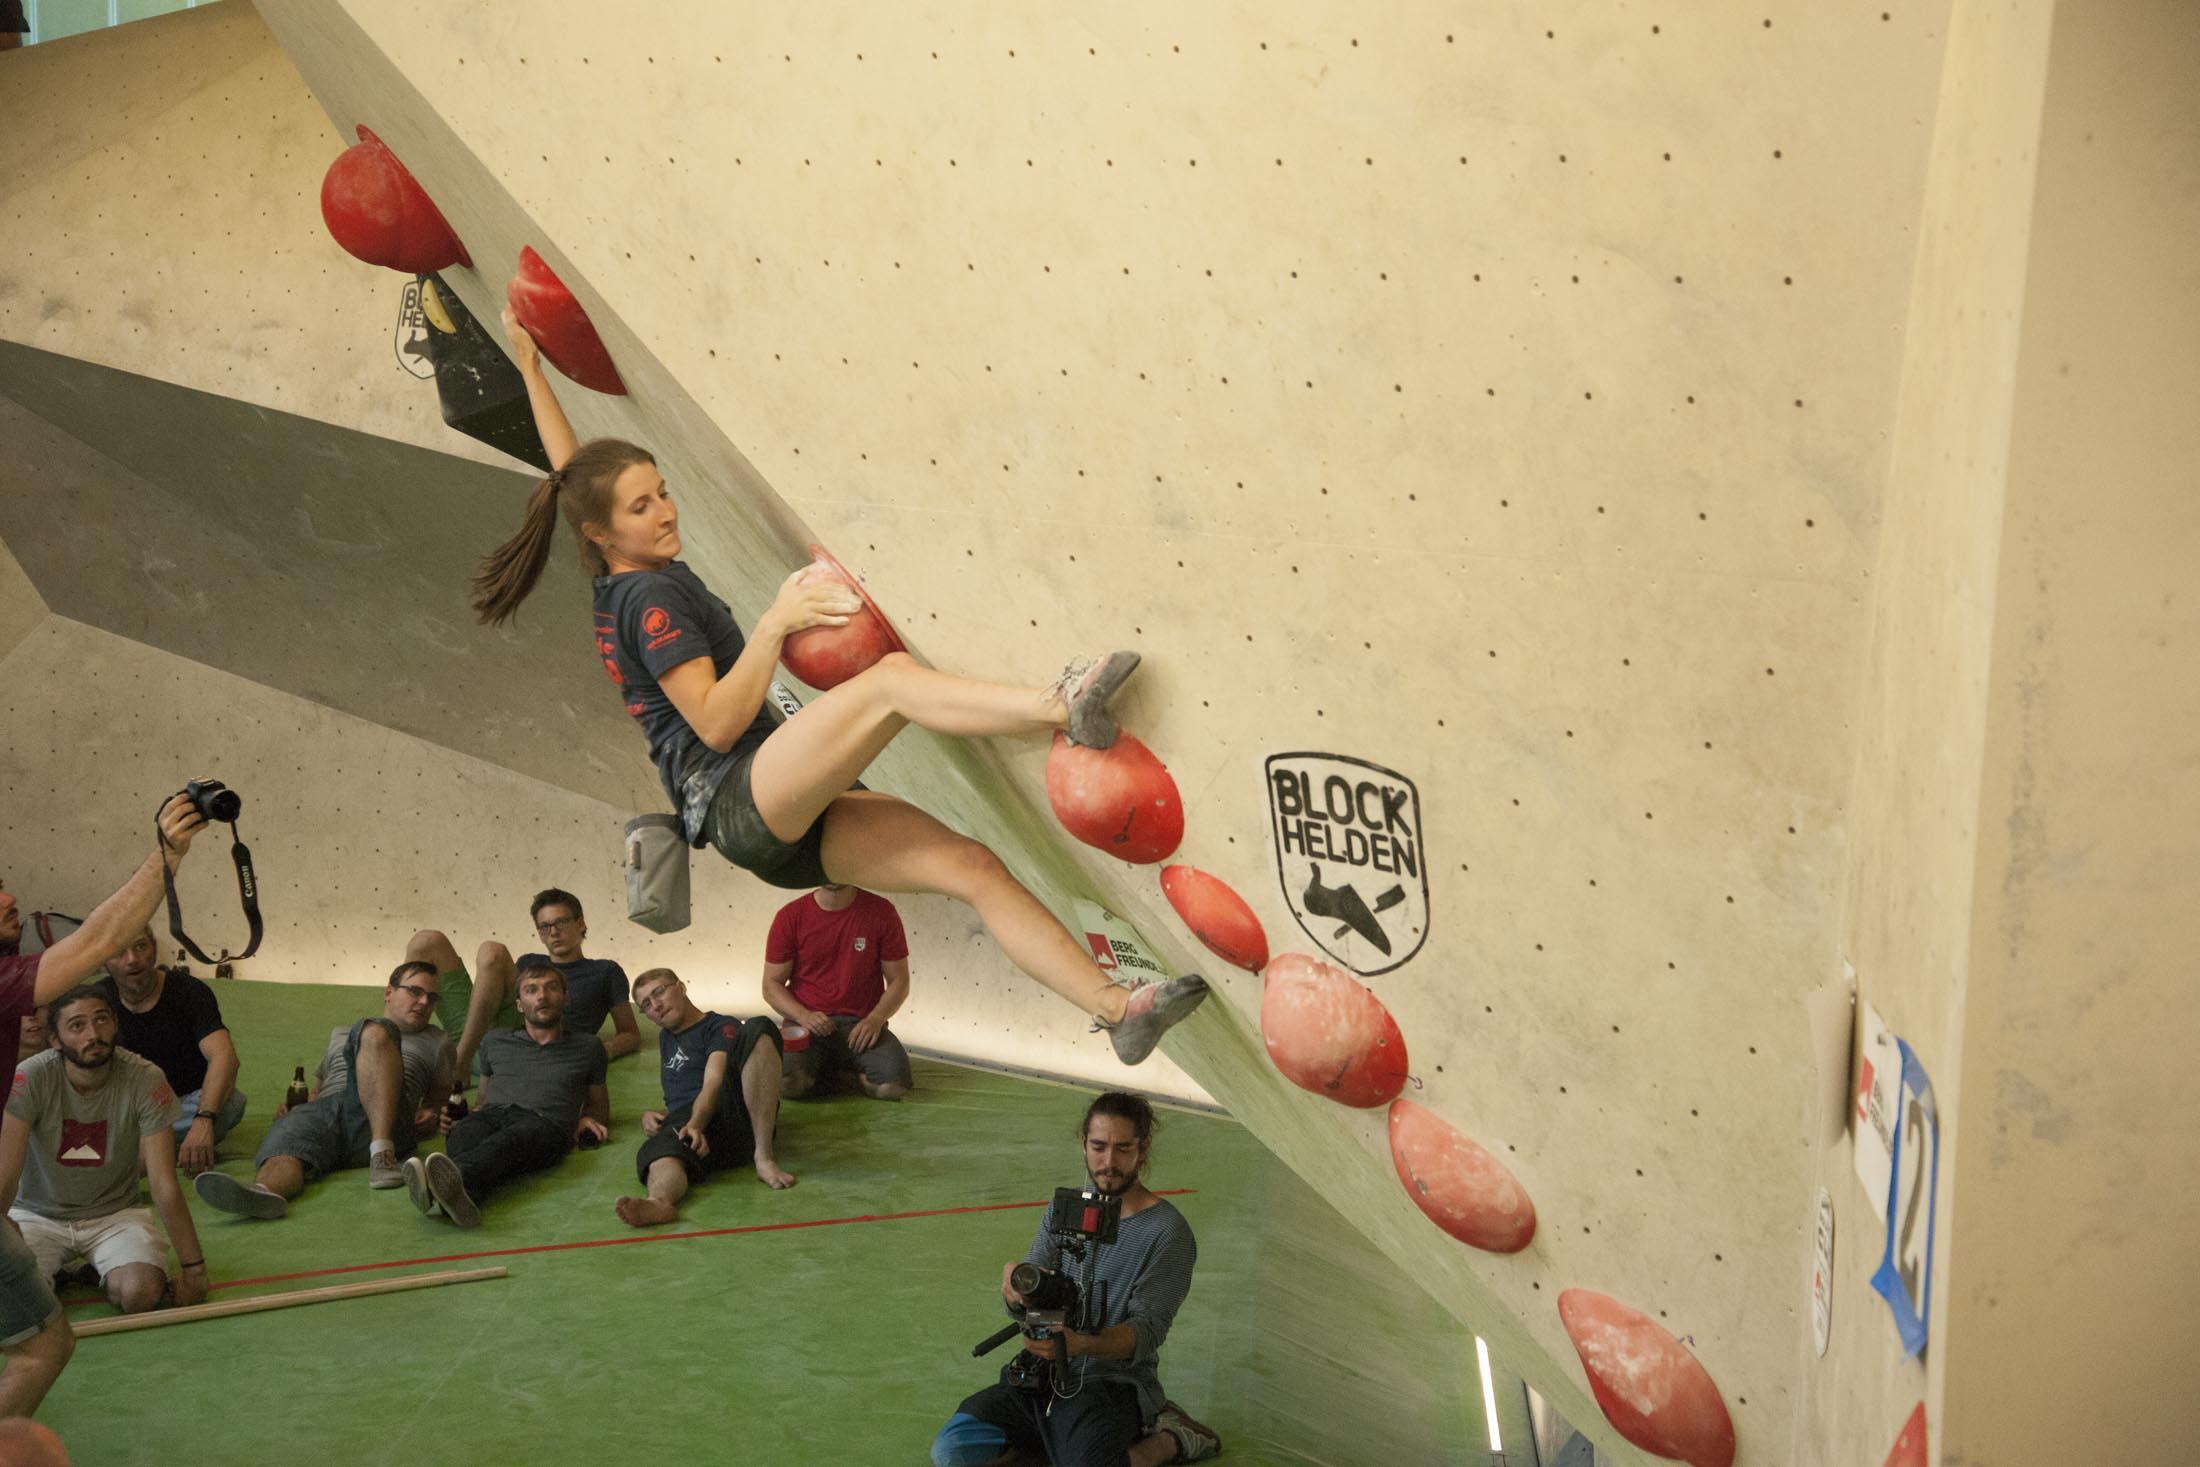 Finale, internationaler bouldercup Frankenjura 2016, BLOCKHELDEN Erlangen, Mammut, Bergfreunde.de, Boulderwettkampf07092016645